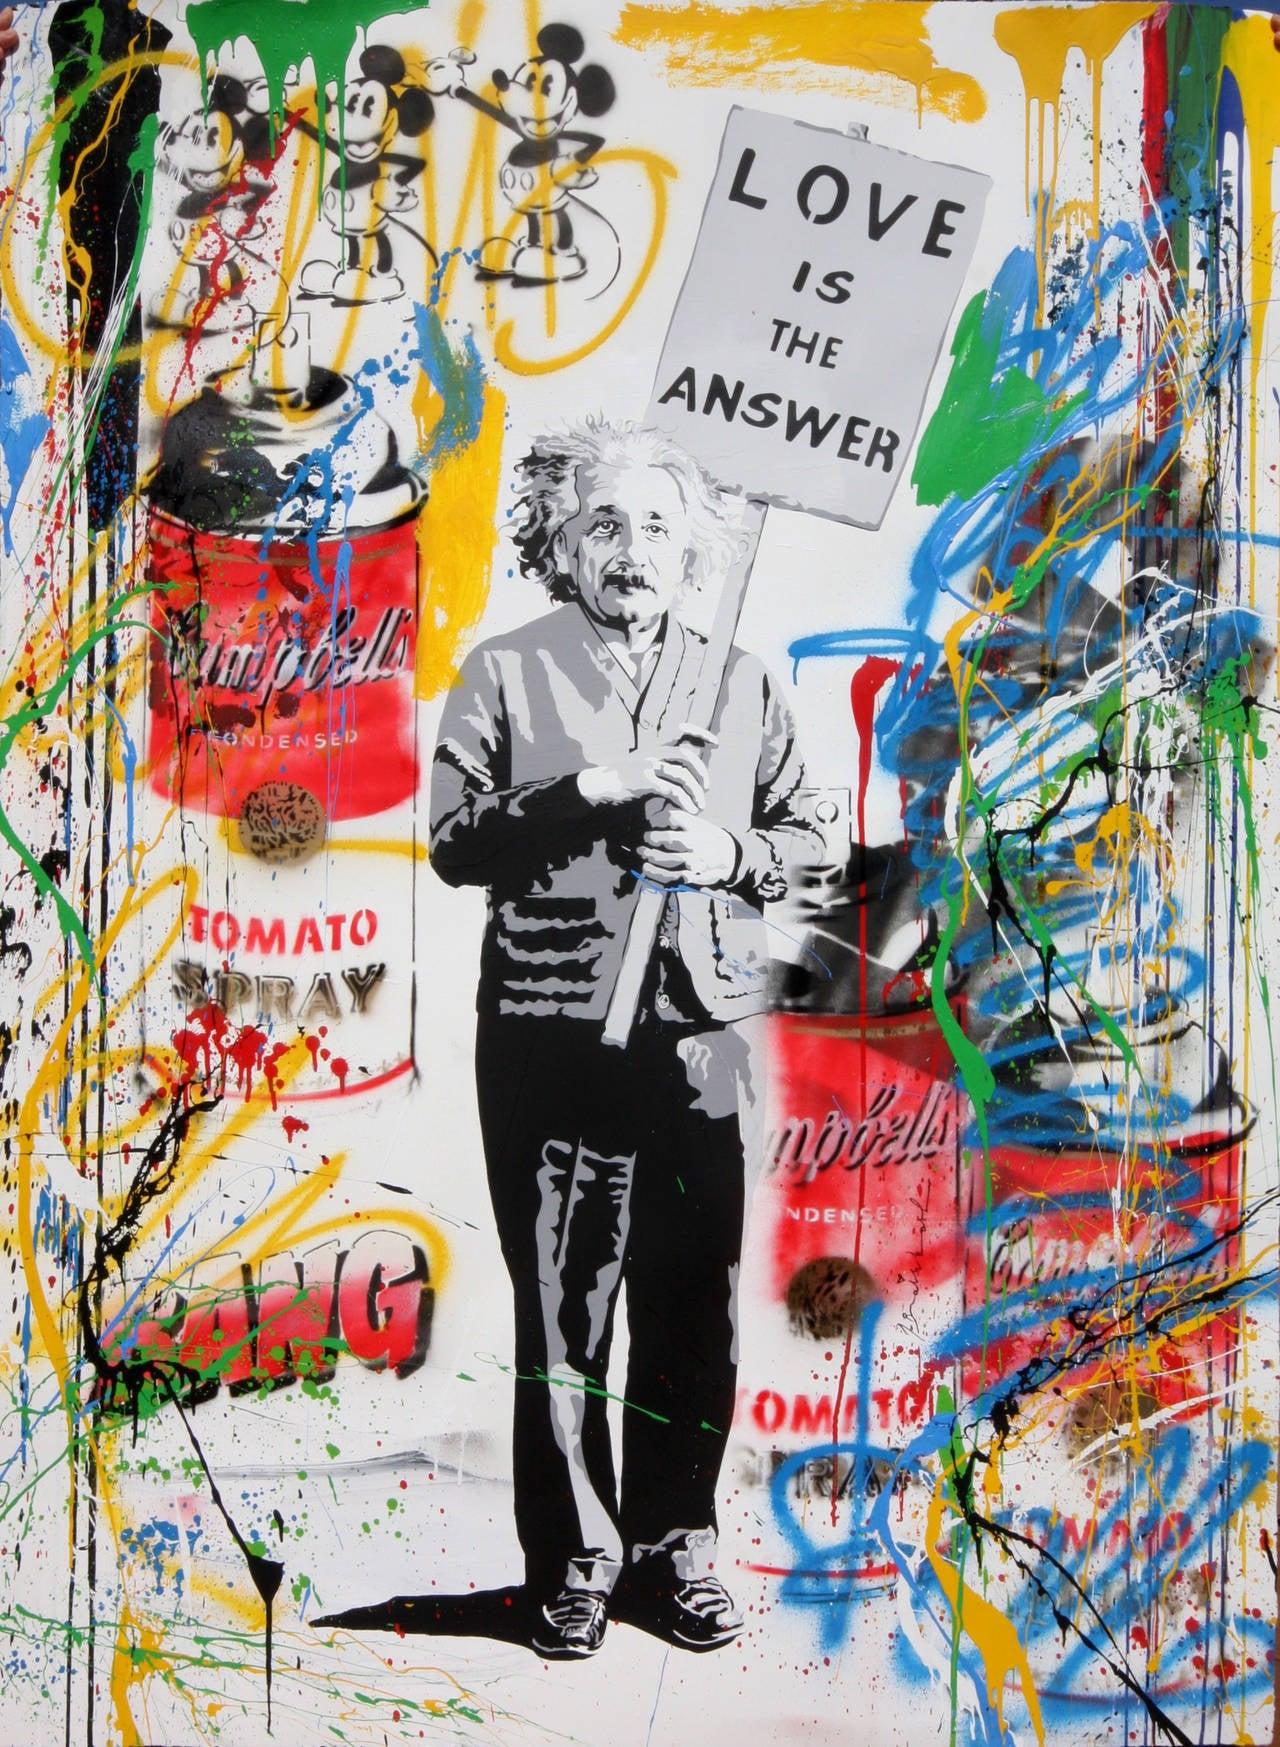 Mr brainwash einstein mixed media mixed media at 1stdibs for Mural painted by street artist mr brainwash